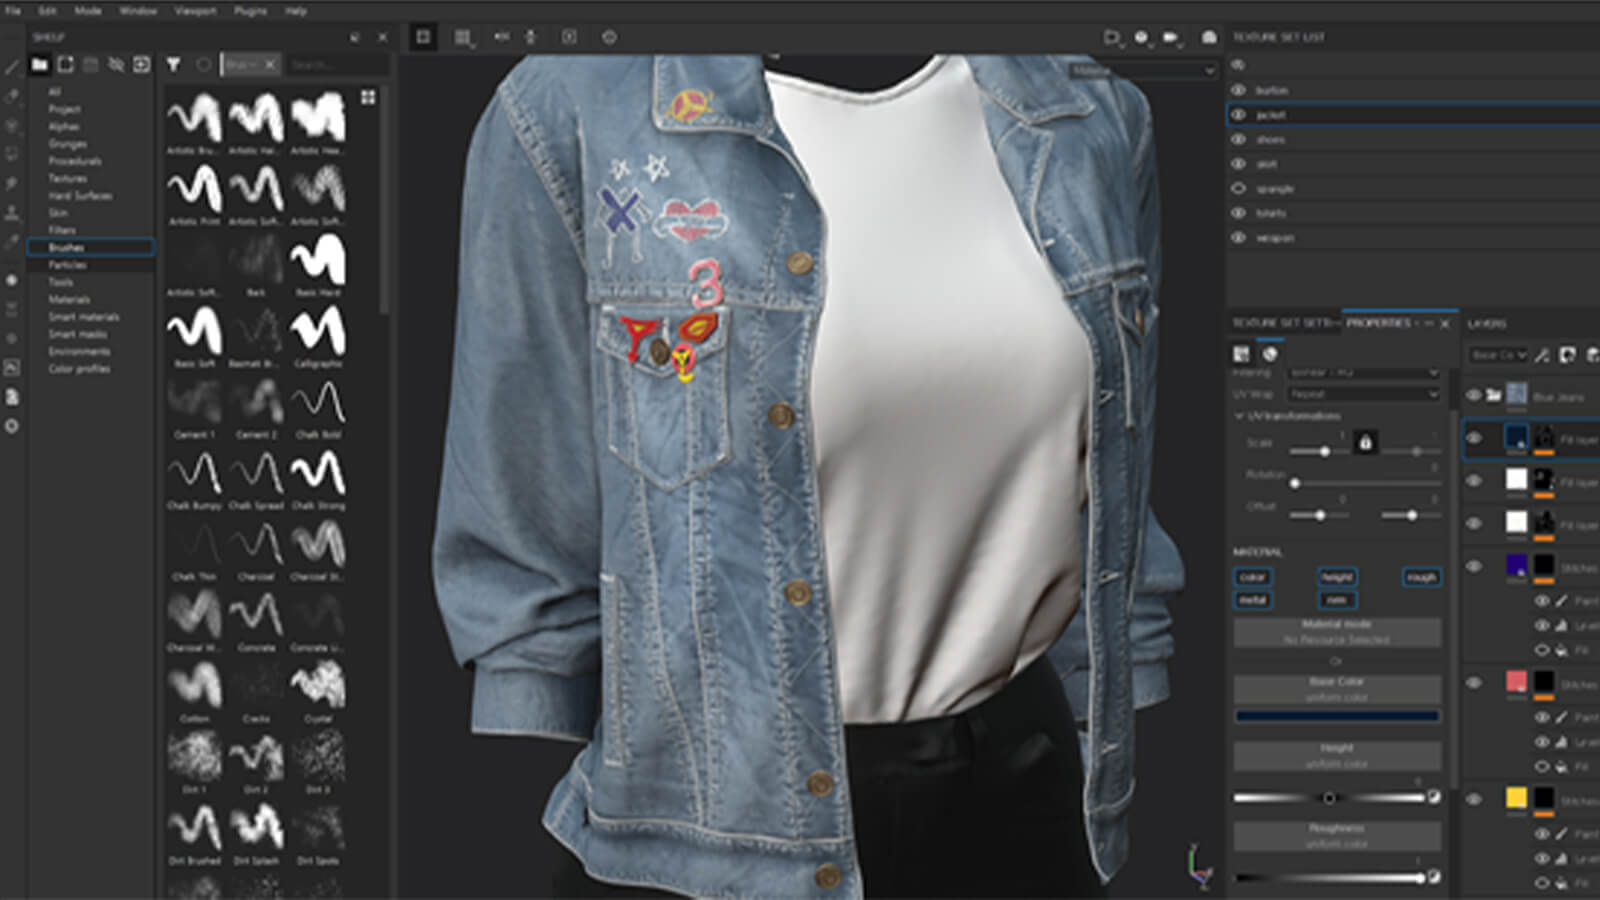 fashion-design-software-tools-marvelous-designer-carousel-image-3